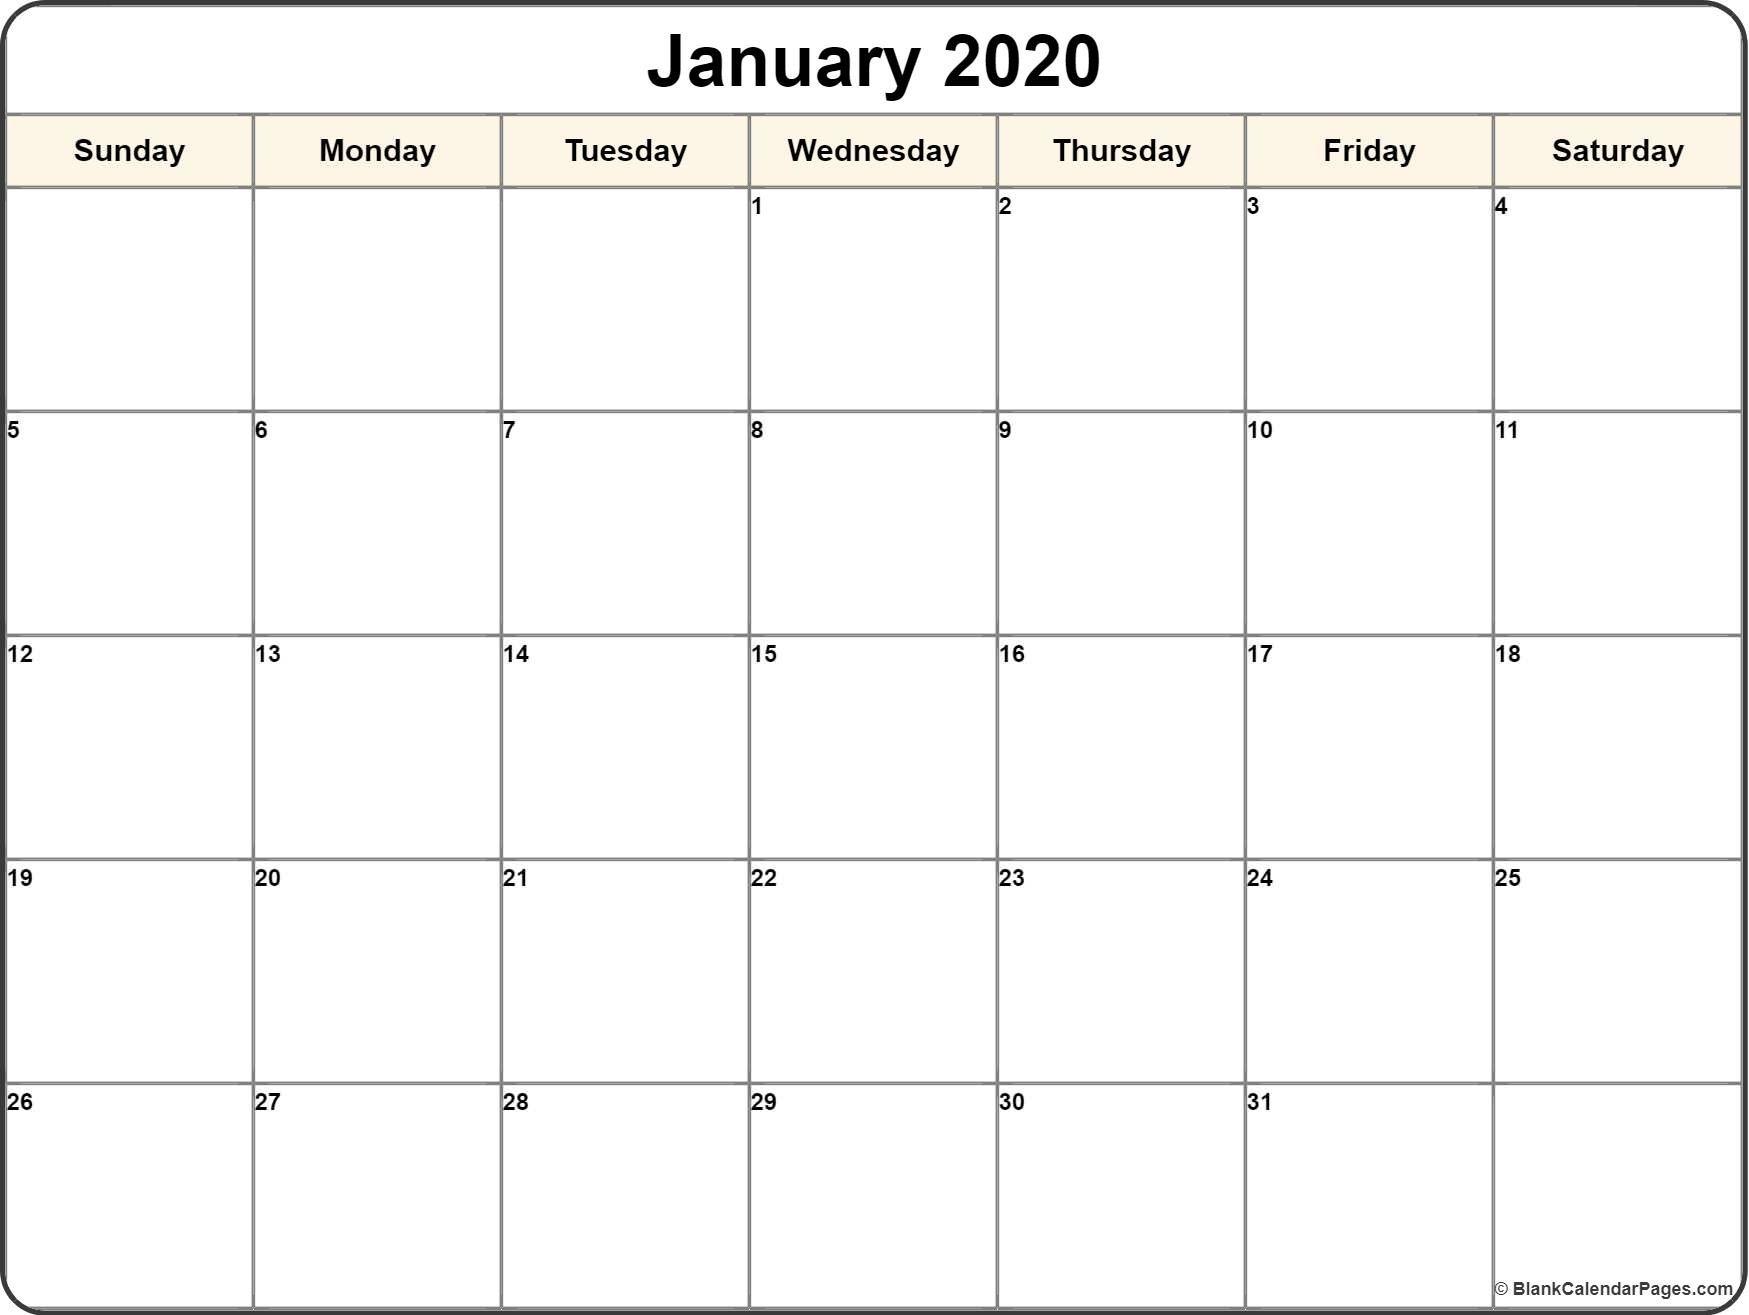 Imom 2020 Calendar Di 2020 within 2020 Calendar Free Printable Imom